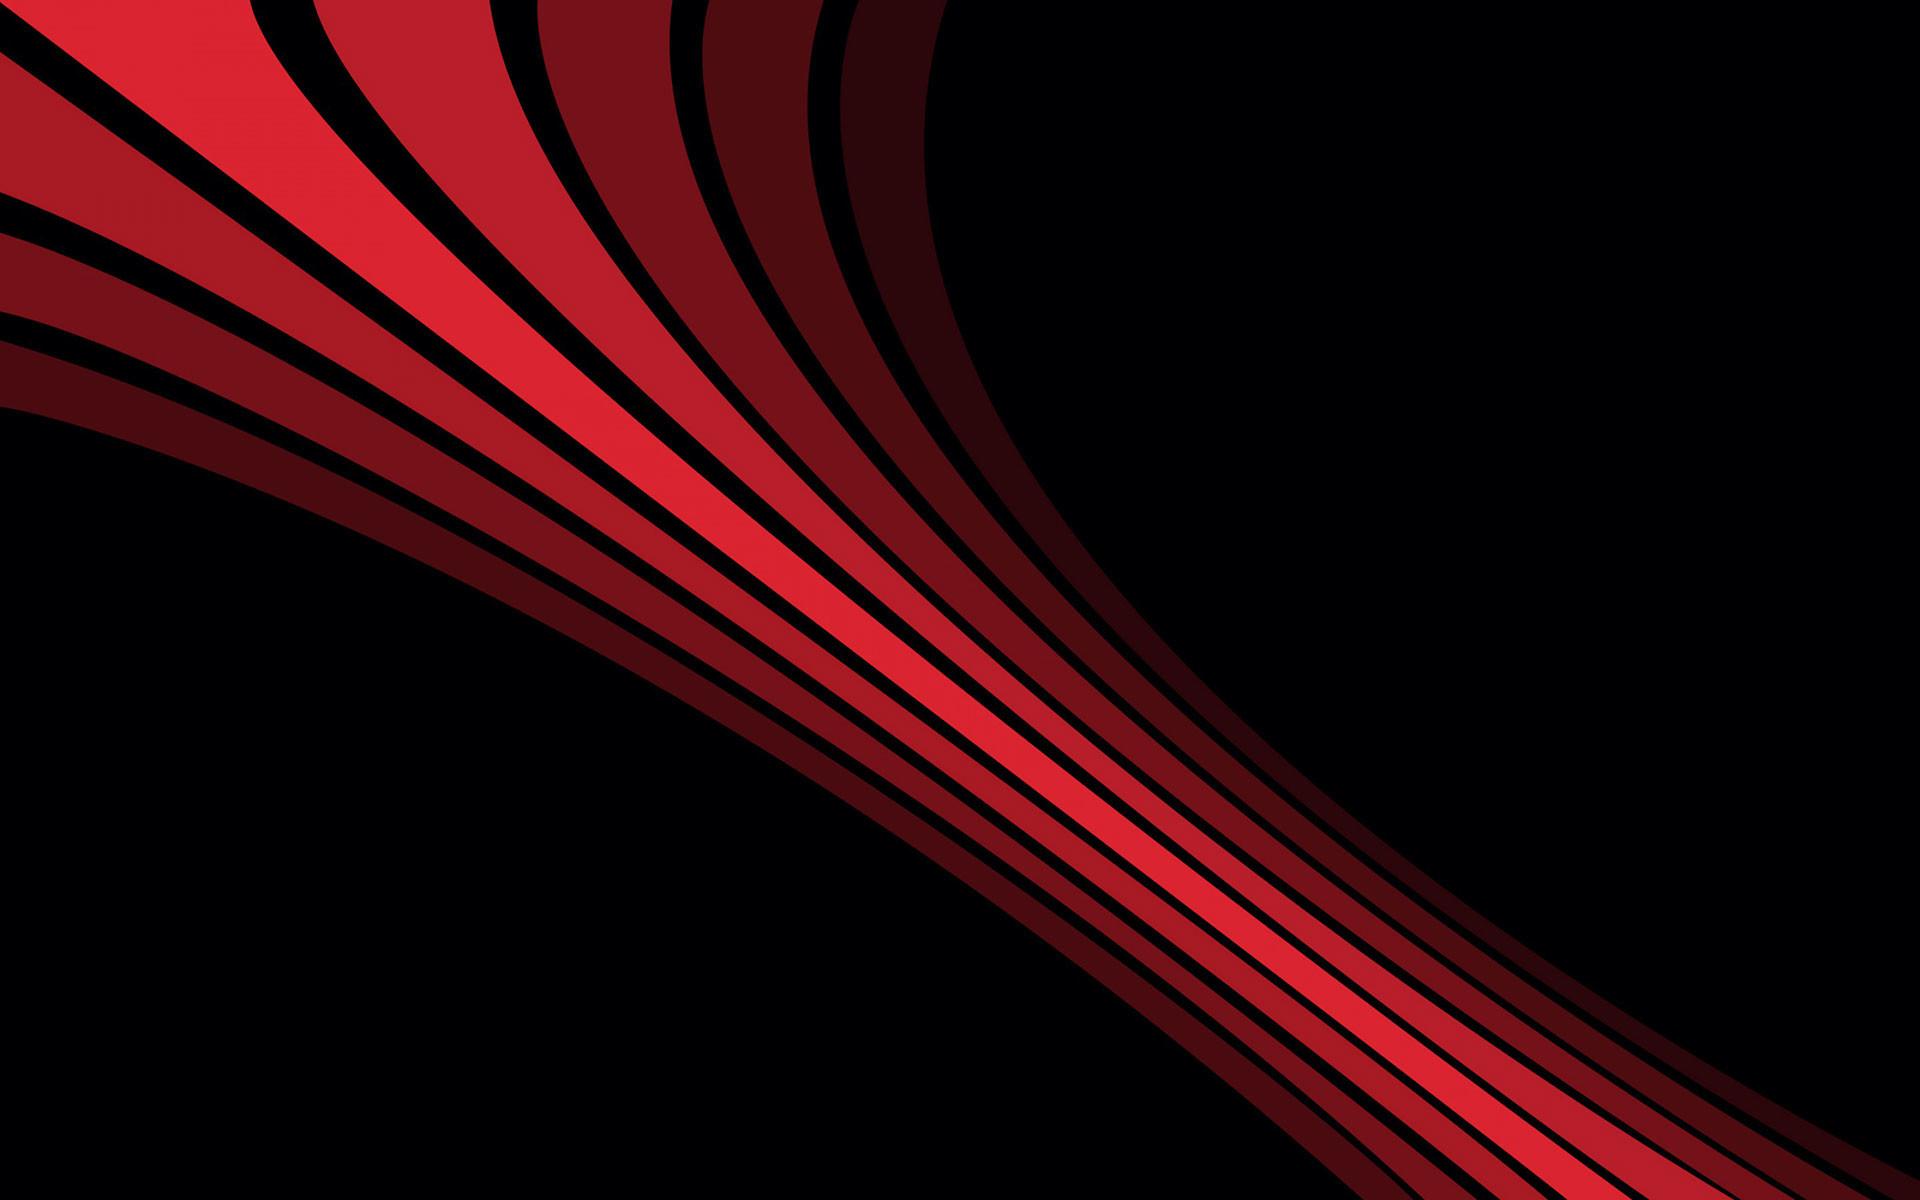 Red Wallpaper 1